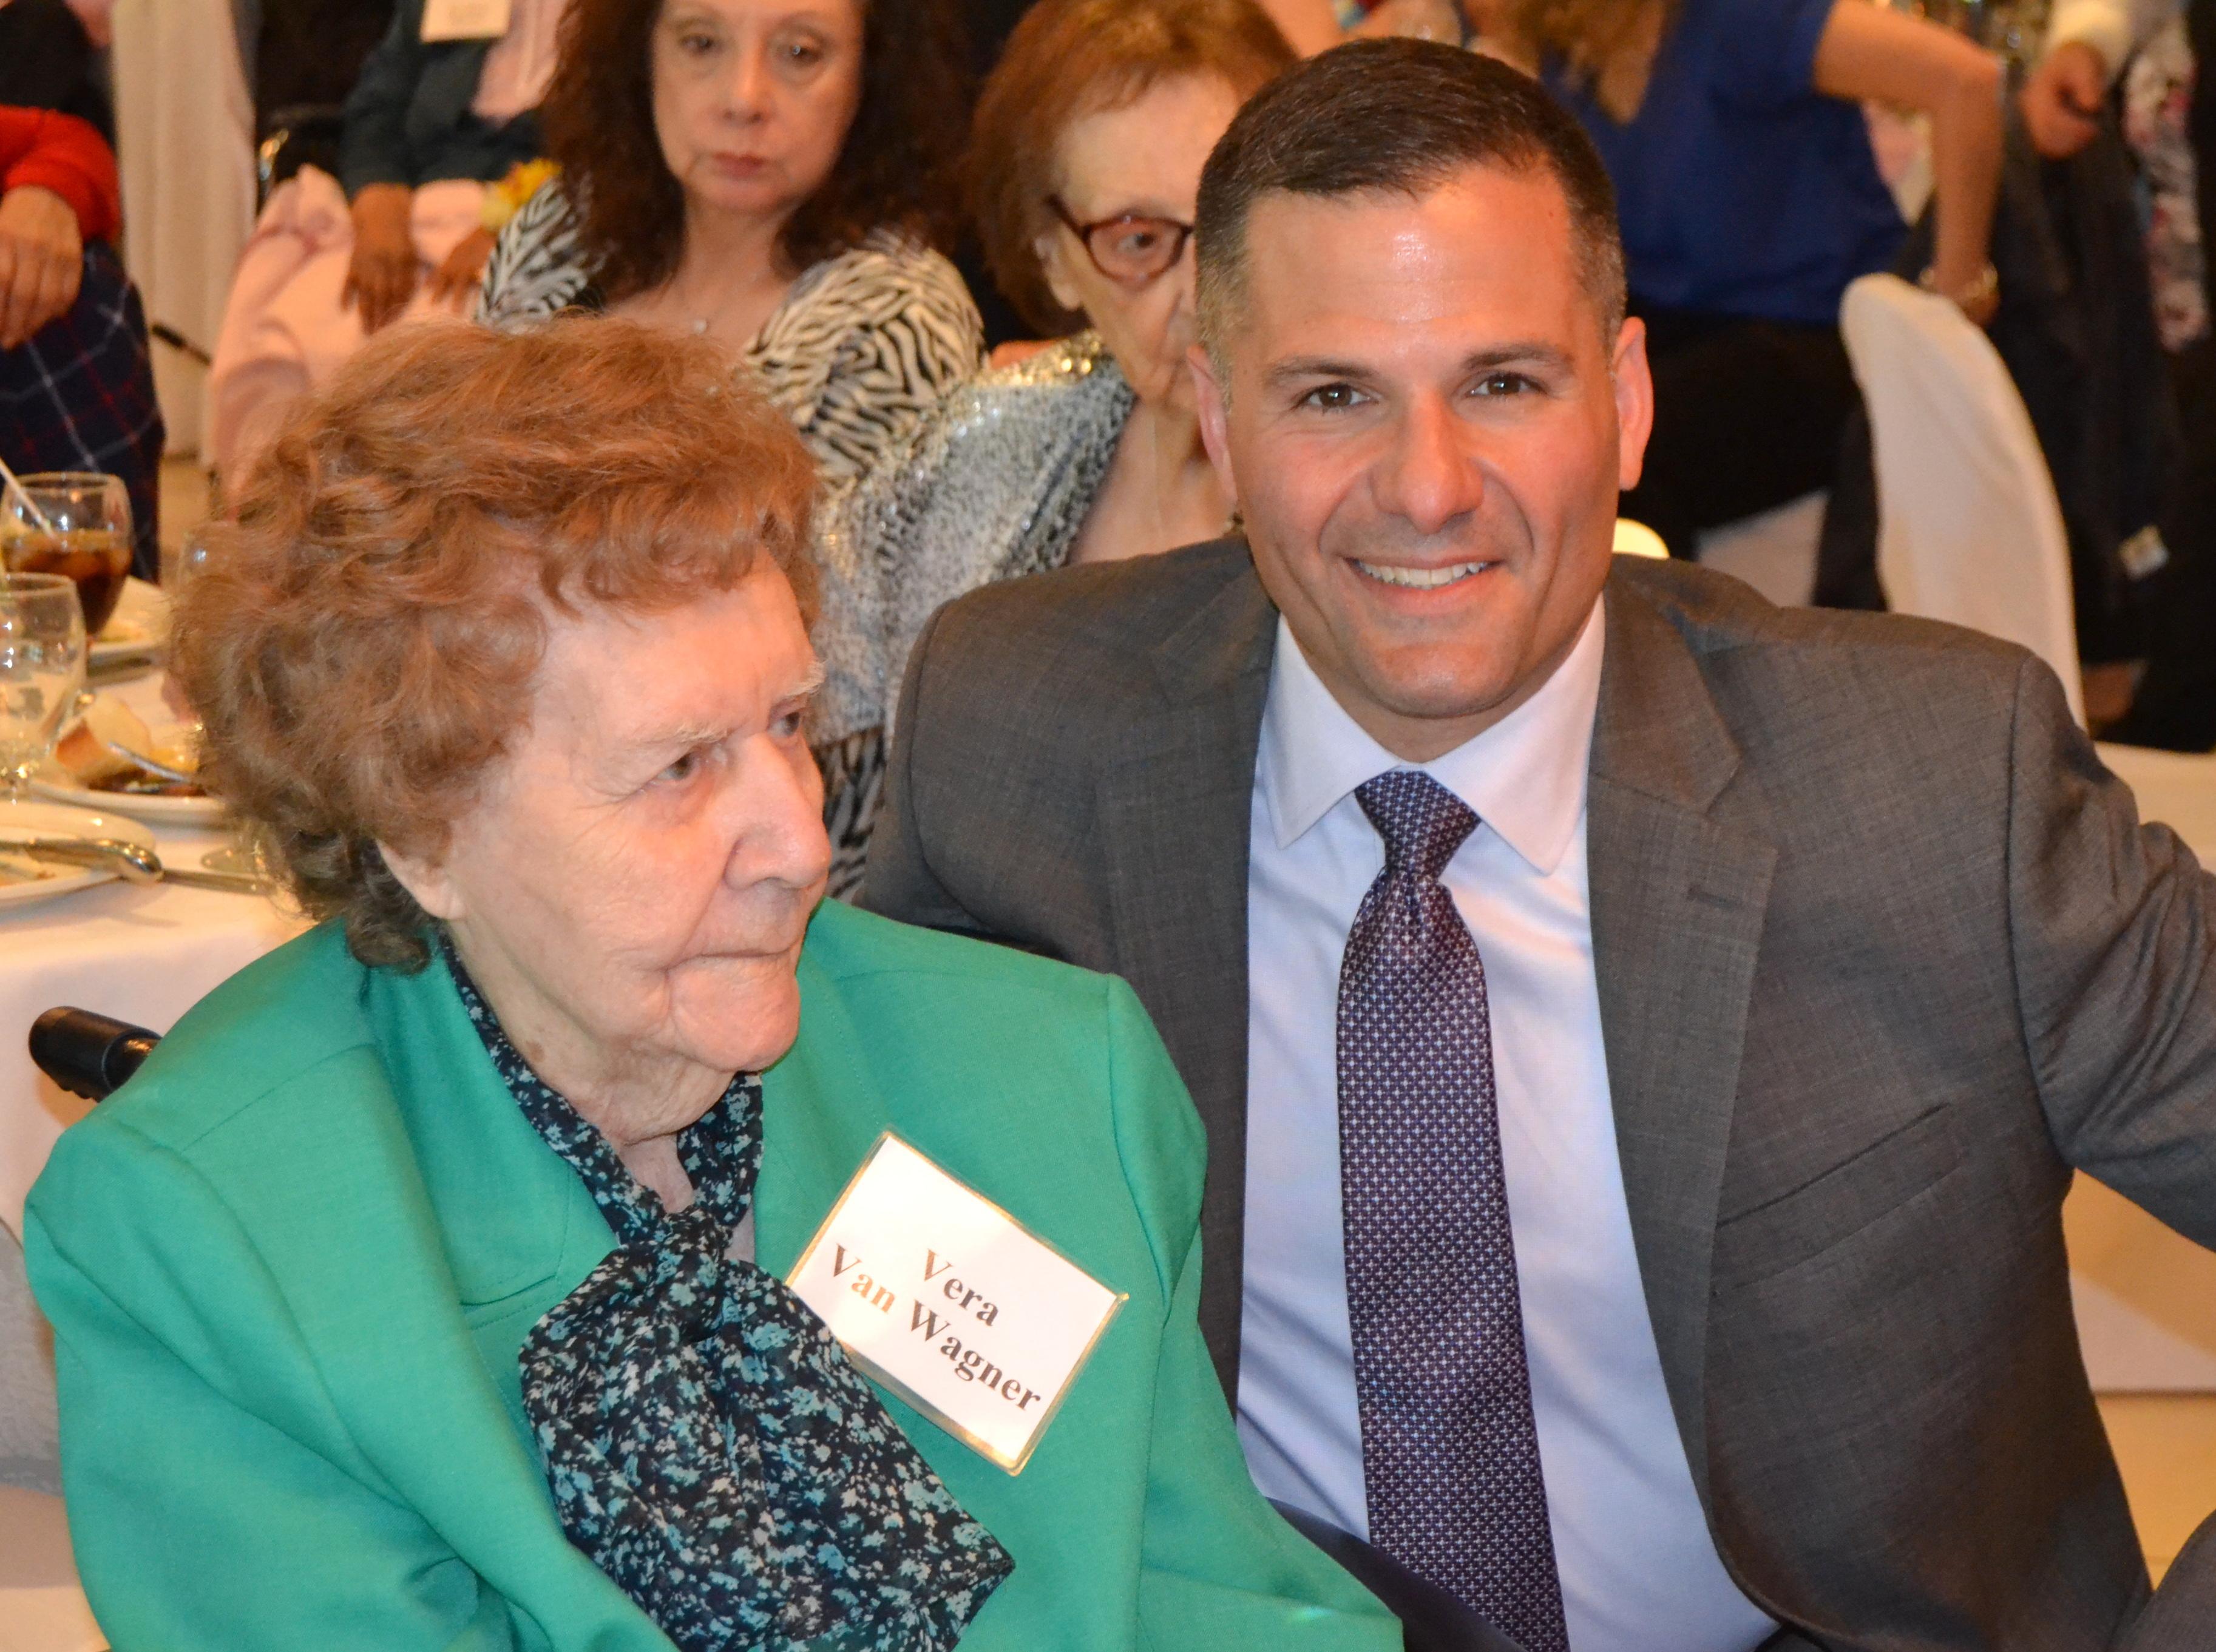 Vera Van Wagner - Super Centenarian at 112 Years Young!